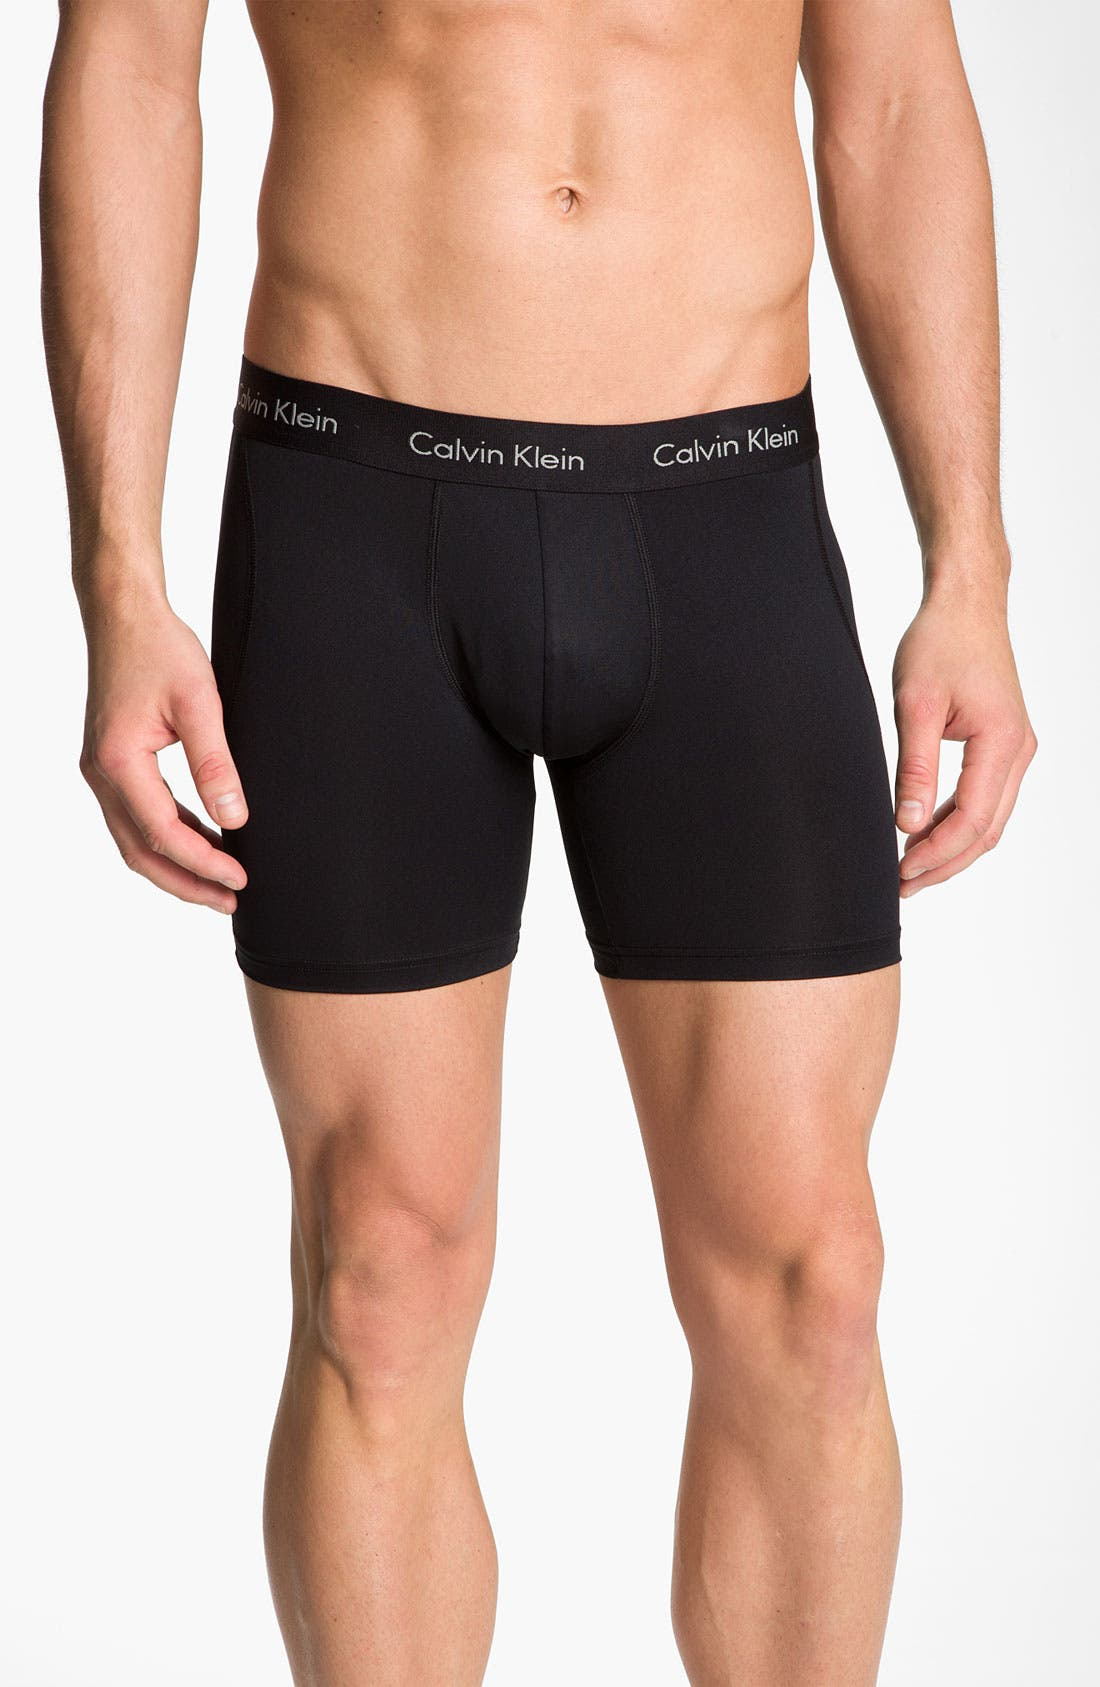 Alternate Image 1 Selected - Calvin Klein Microfiber Boxer Briefs (2-Pack)